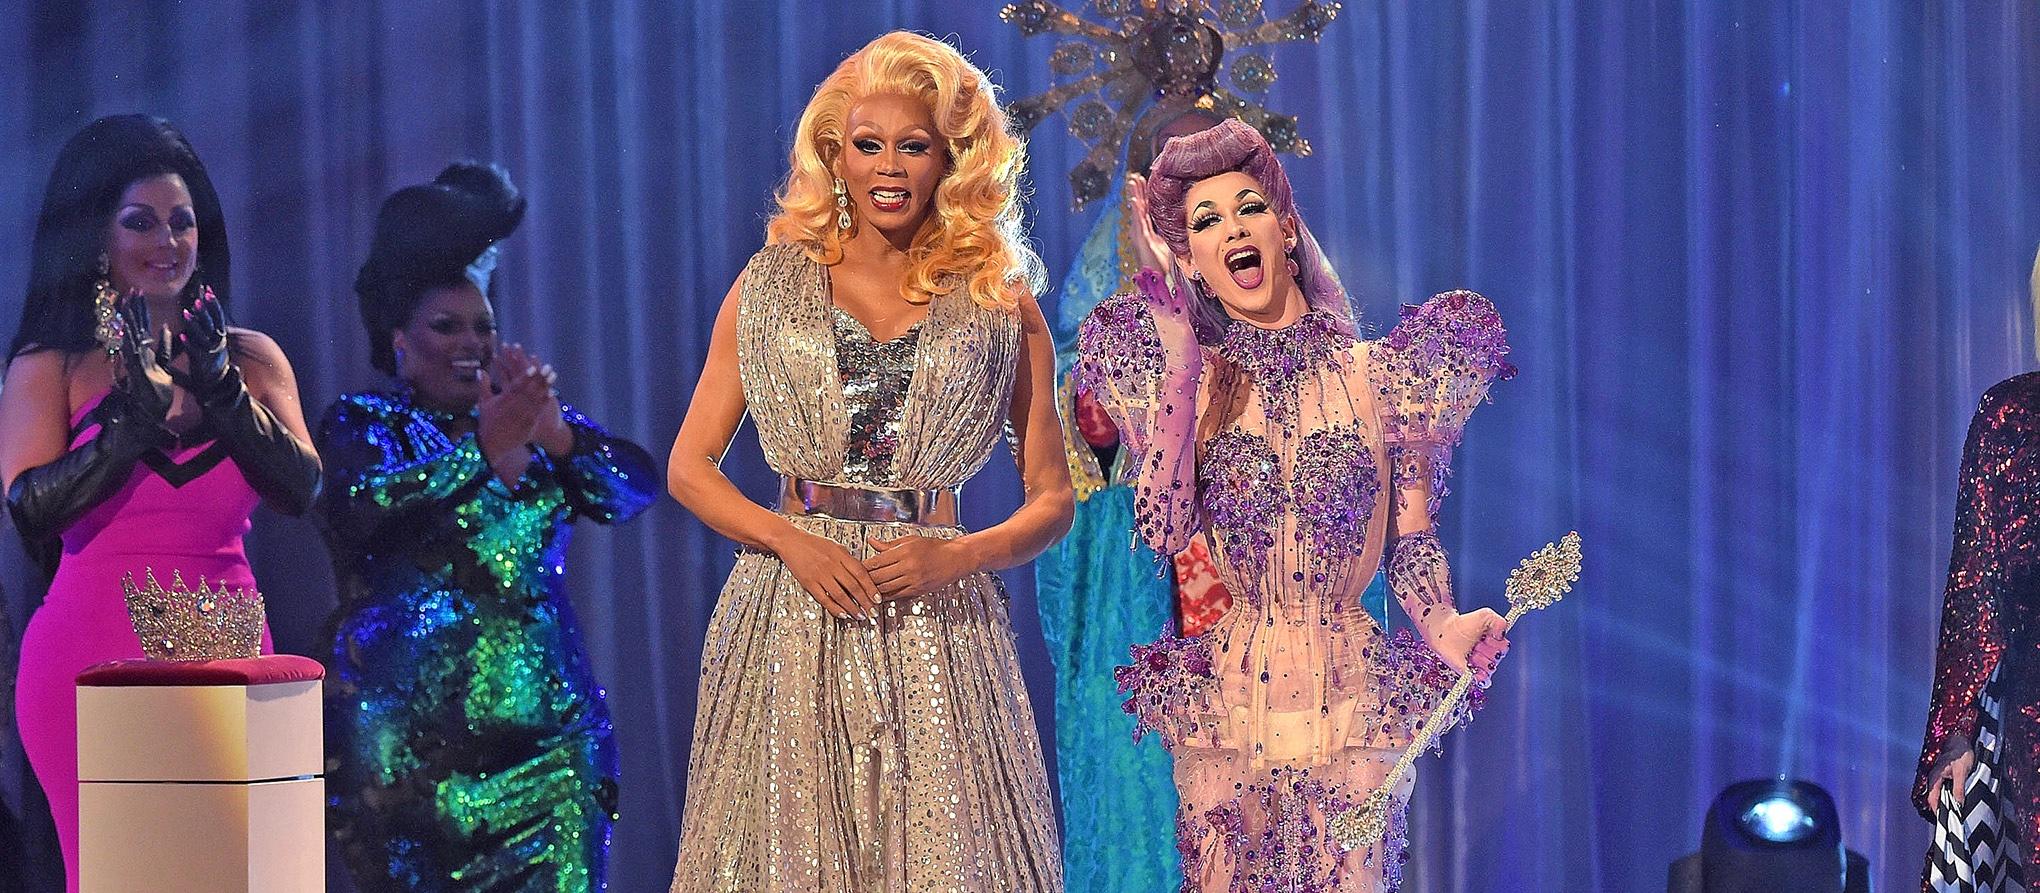 wsi-imageoptim-RuPauls-Drag-Race-Best-Contestants.jpg